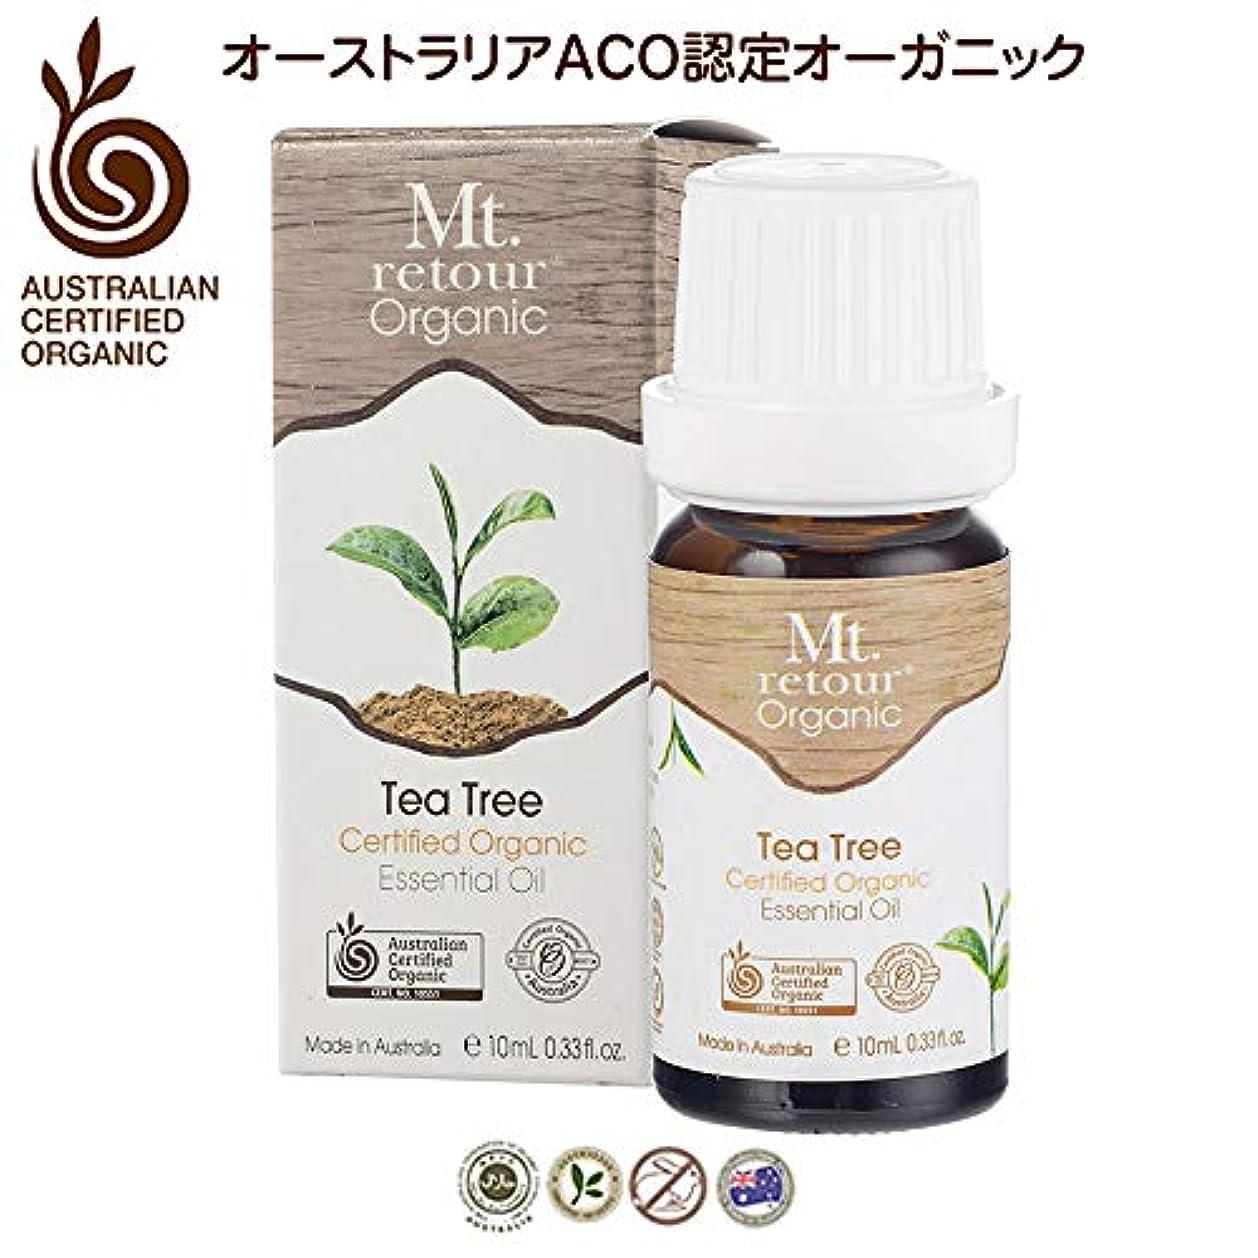 Mt. retour ACO認定オーガニック ティーツリー 10ml エッセンシャルオイル(無農薬有機)アロマ